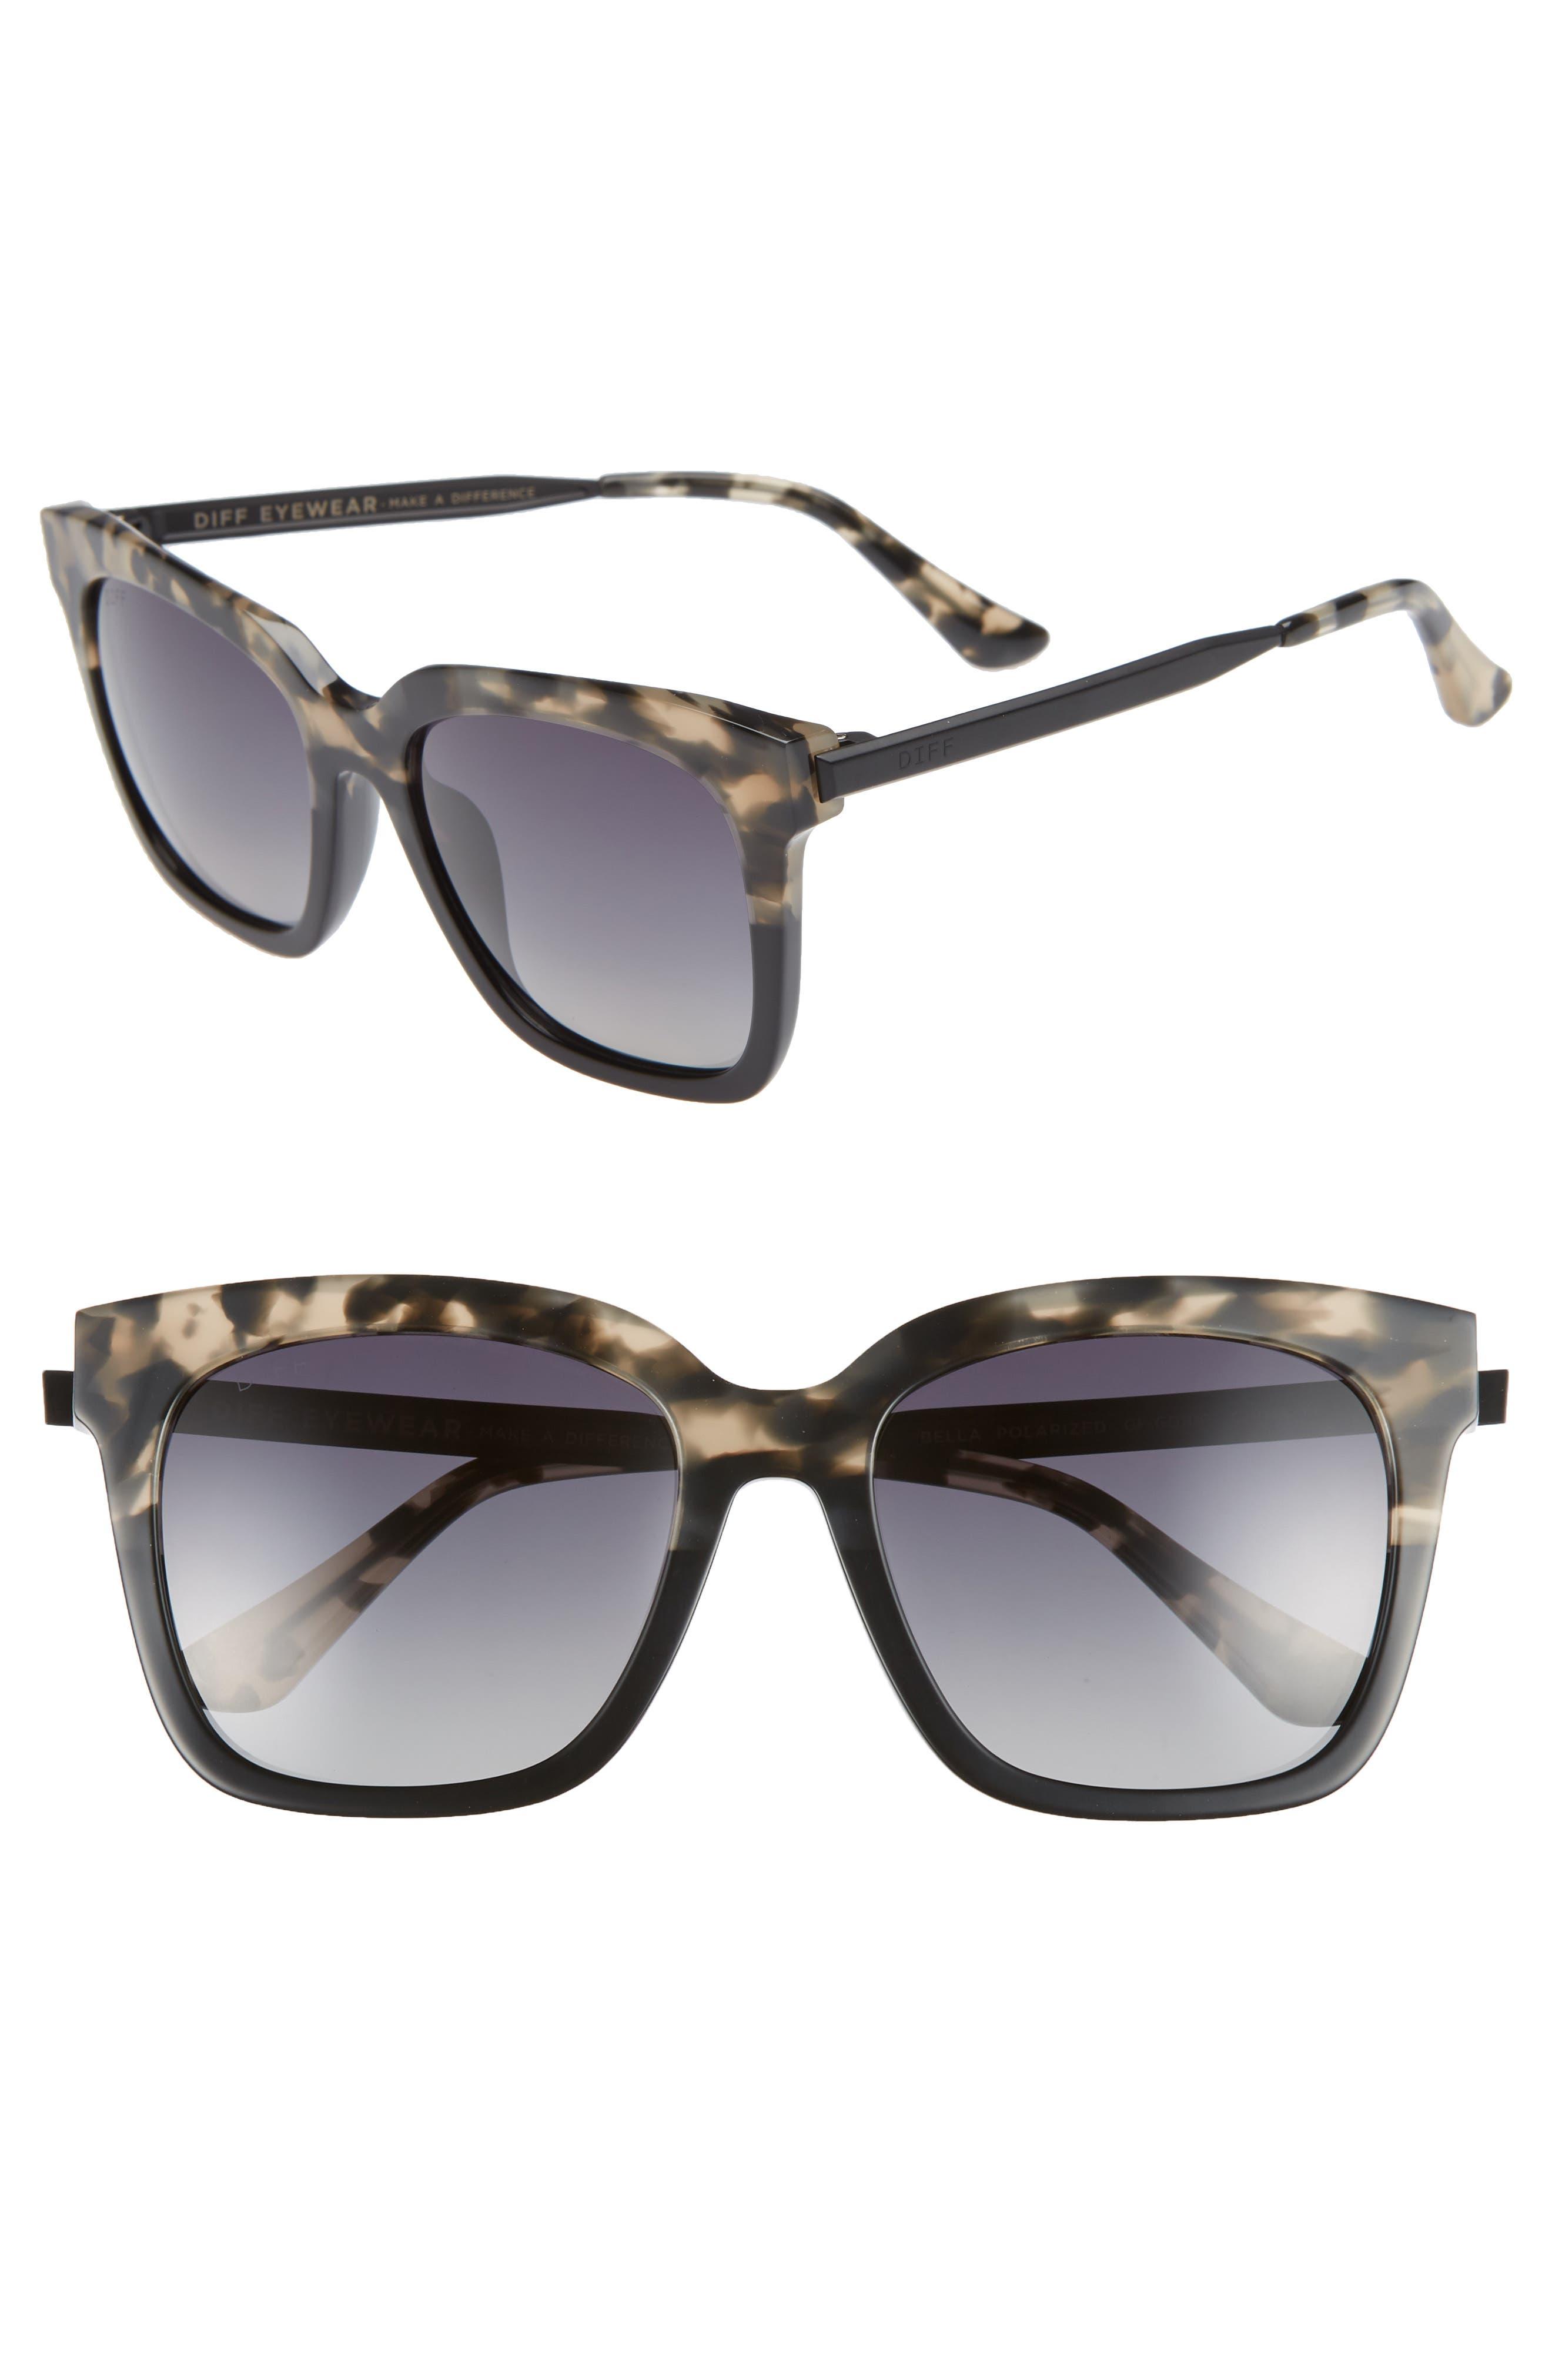 DIFF, Bella 52mm Polarized Sunglasses, Main thumbnail 1, color, GREY FAGE/ GREY